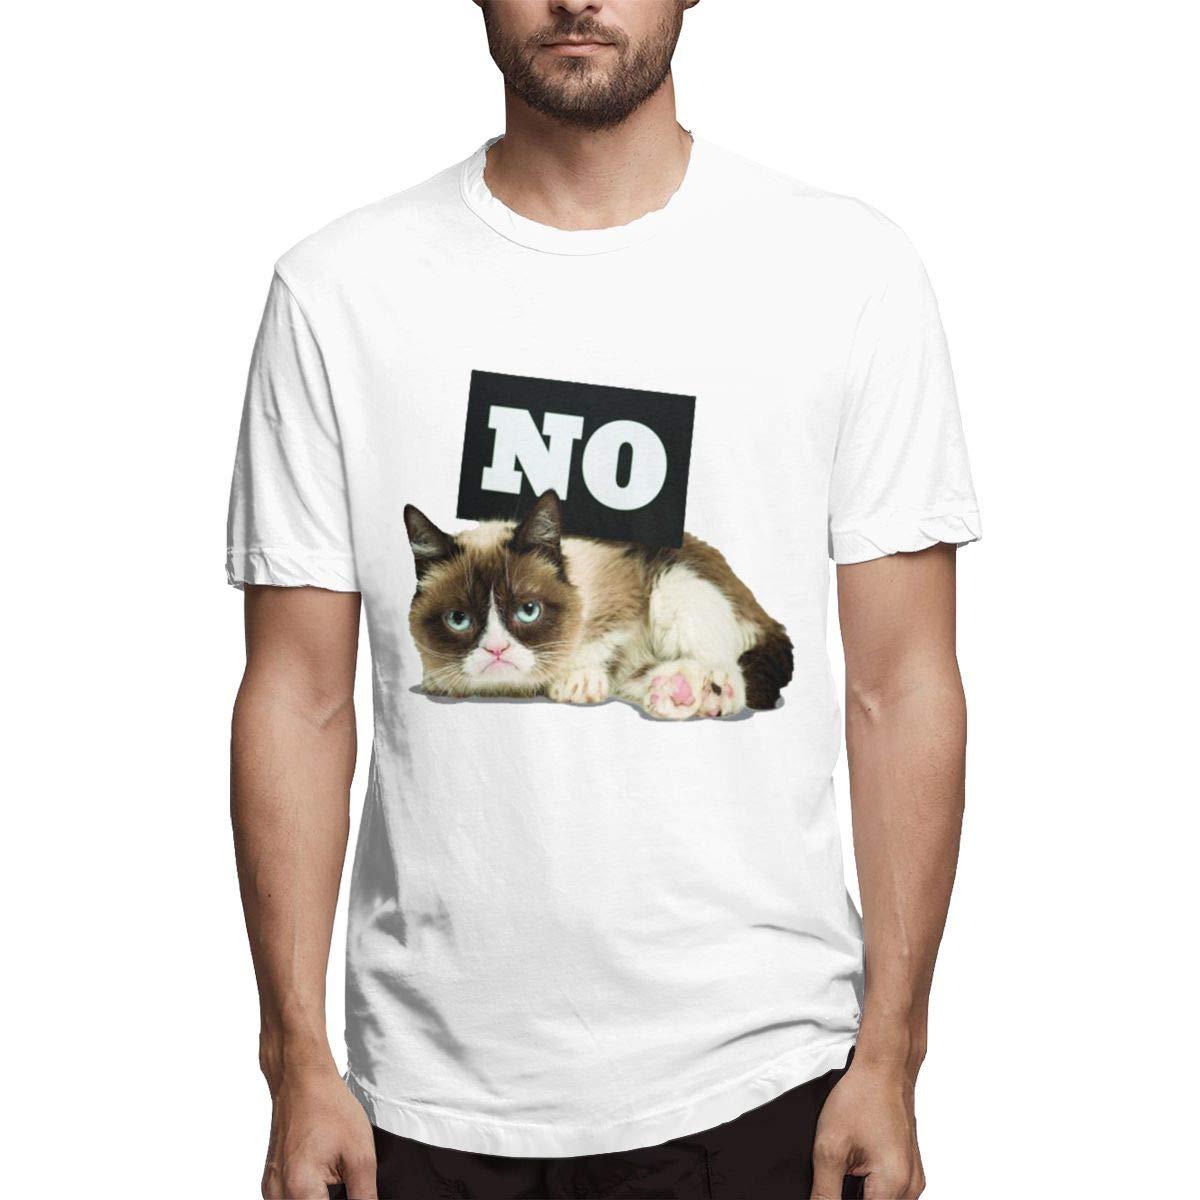 VIIHAHN Mens Round Neck Short Sleeve Shirt Slightly Elastic Grumpy Cat How About No Print 100/% Cotton Shirts Tee